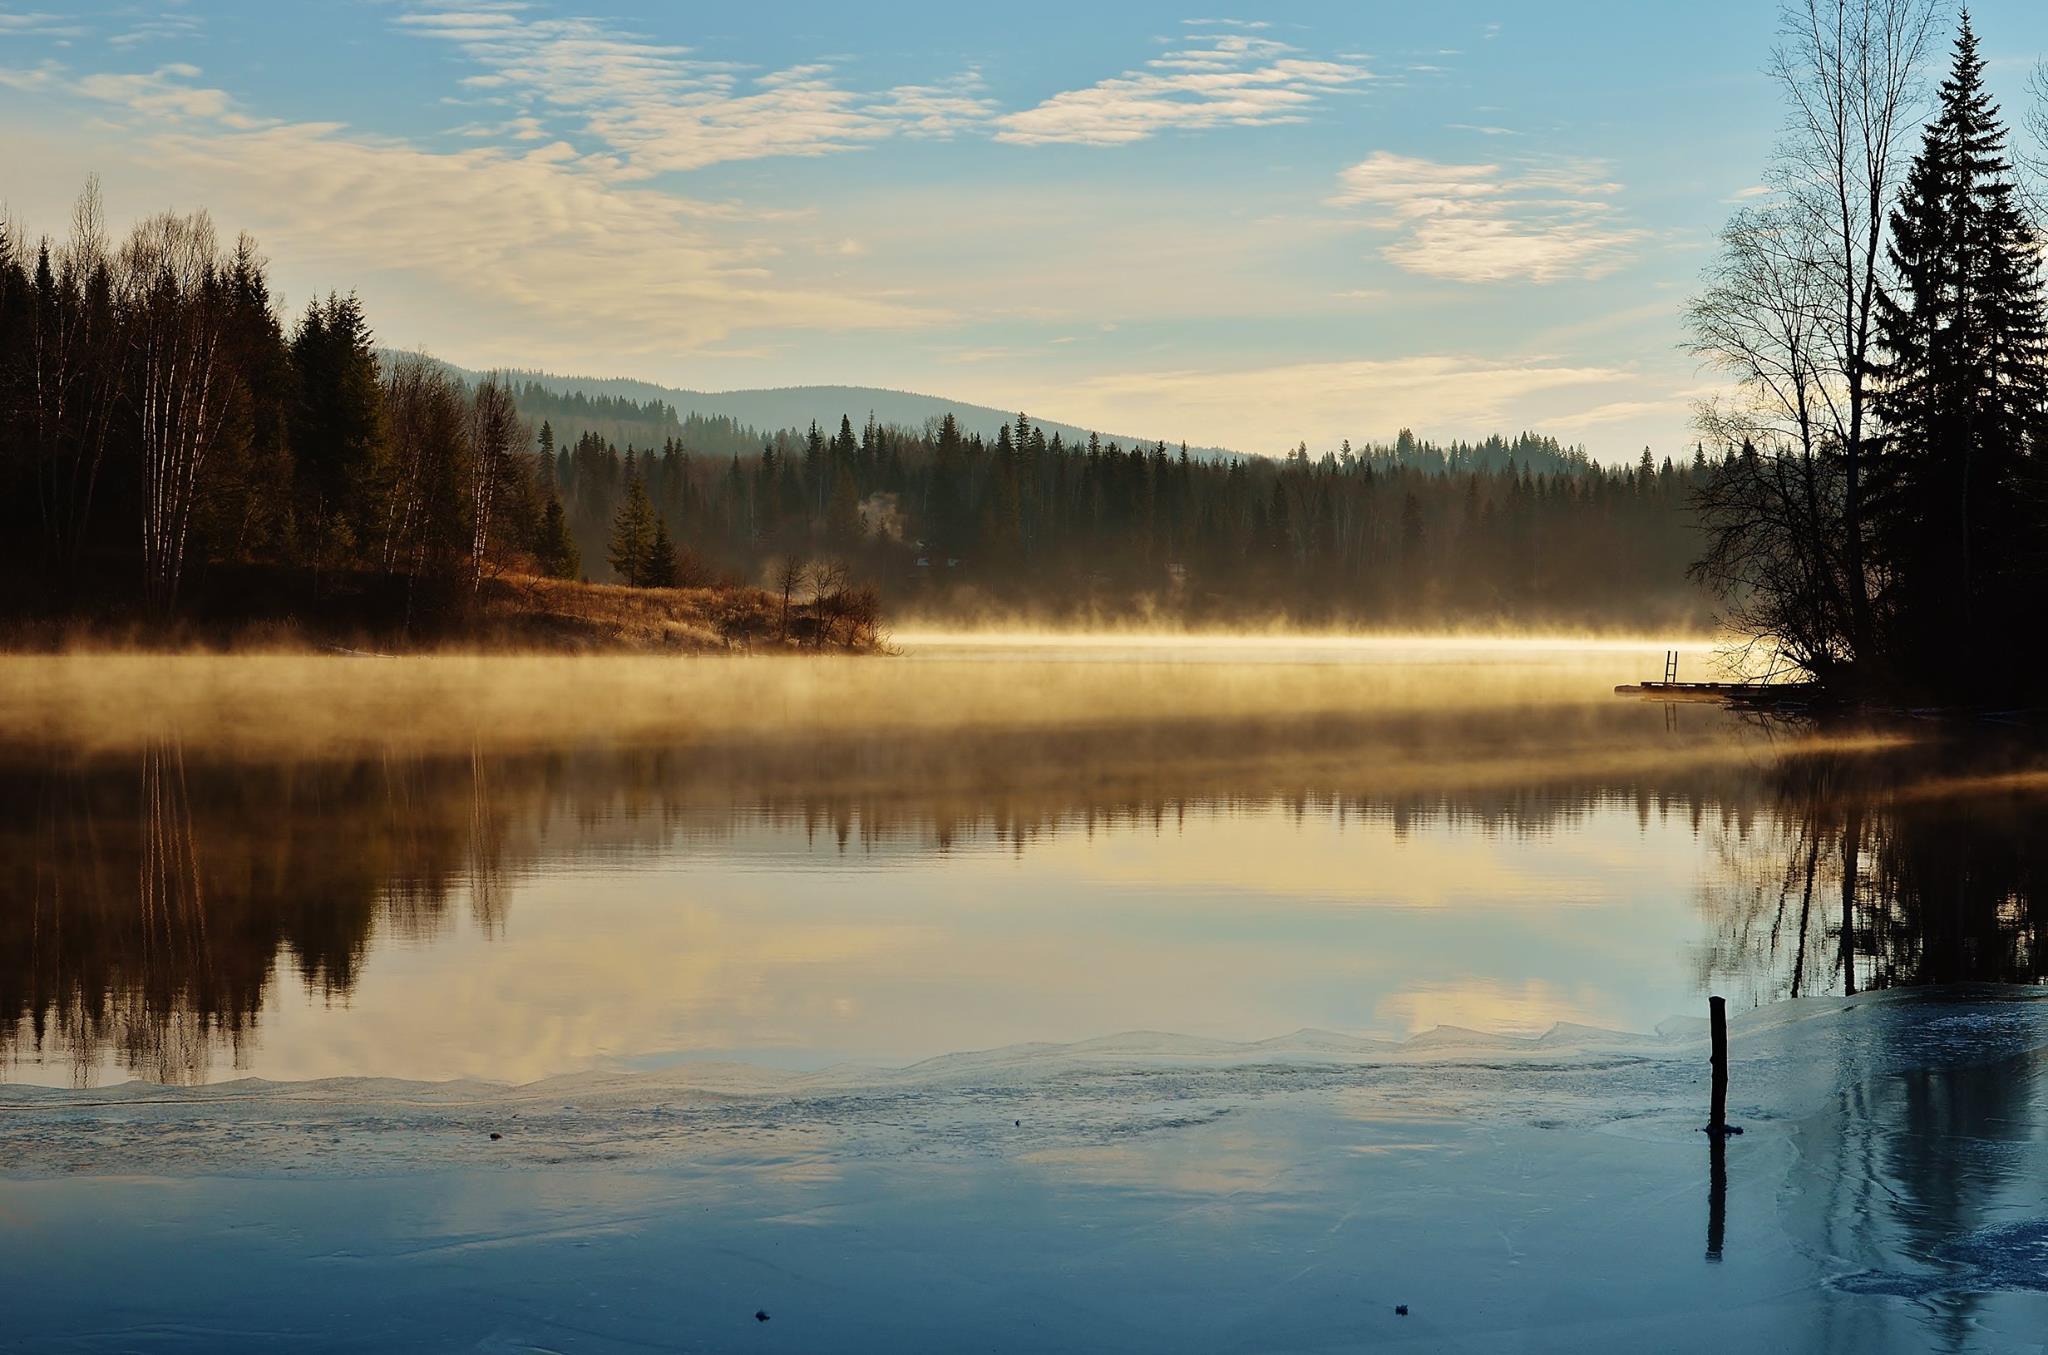 Early morning over Horsefly Lake